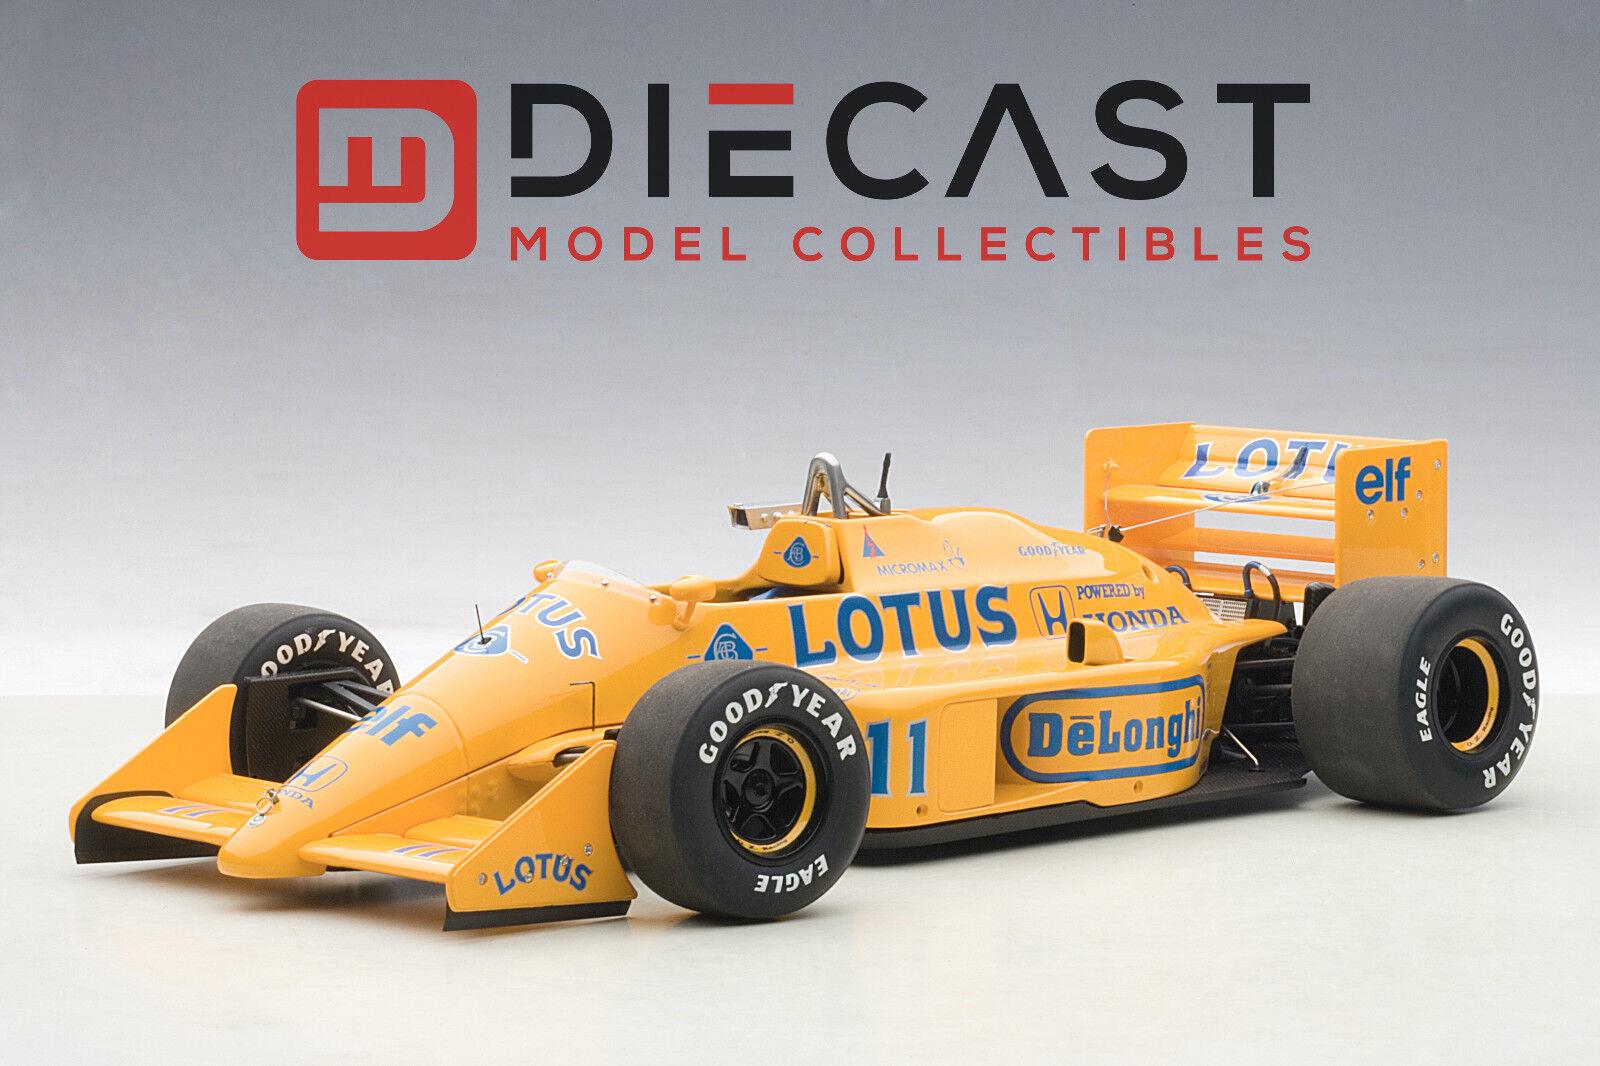 AUTOART 88726 LOTUS 99 T Honda F1 Grand Prix du Japon 1987 S. Nakajima  11, 1 18TH échelle